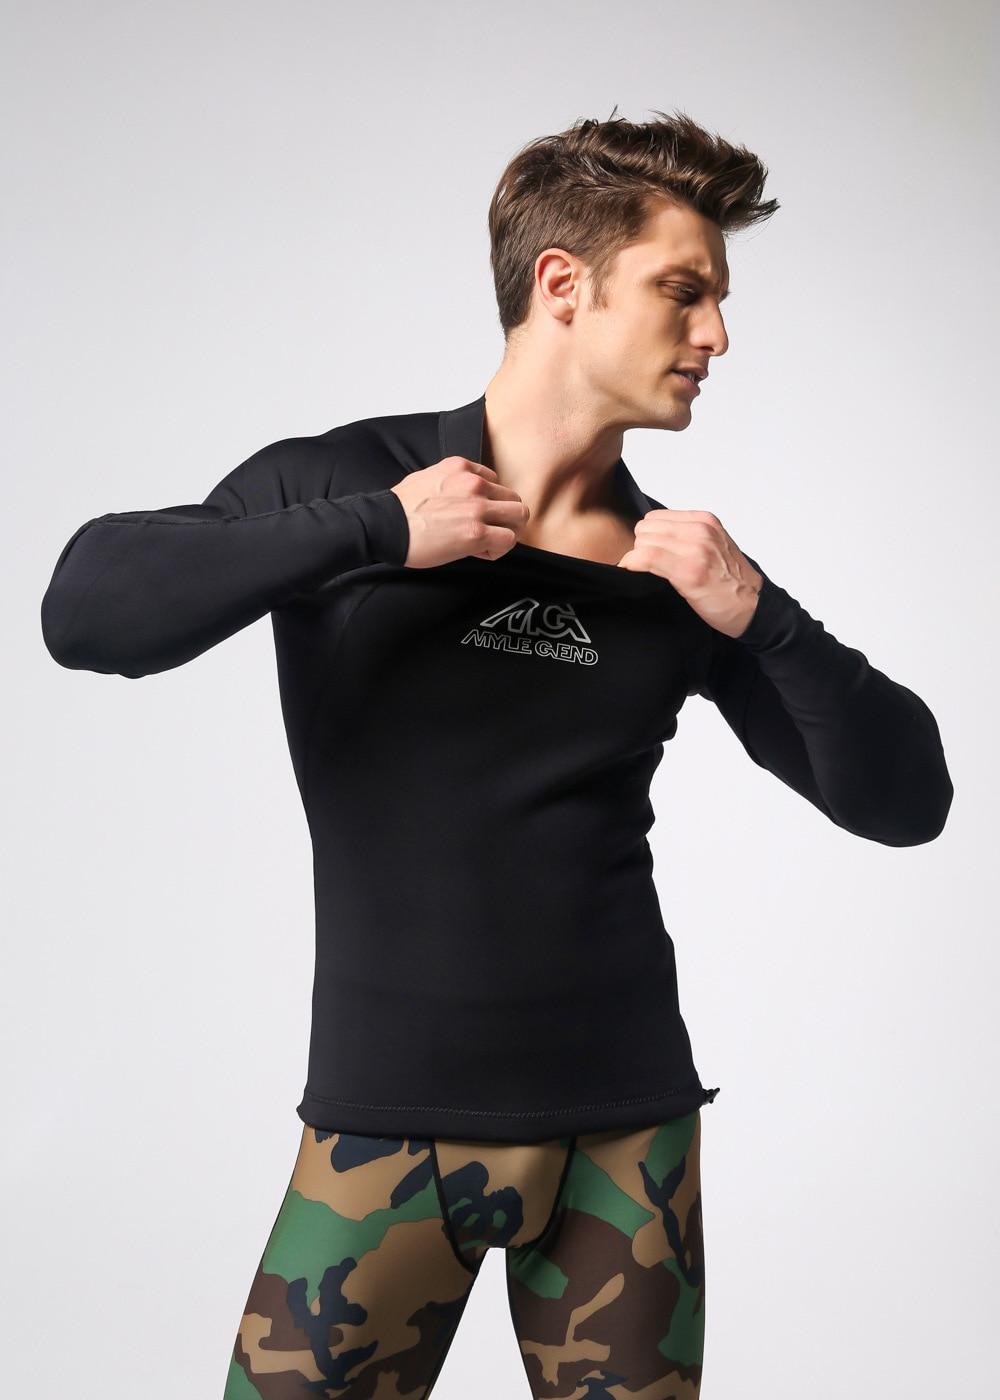 ФОТО A spot on behalf of man CR super elastic neoprene jacket surf clothing wetsuit top diving suit